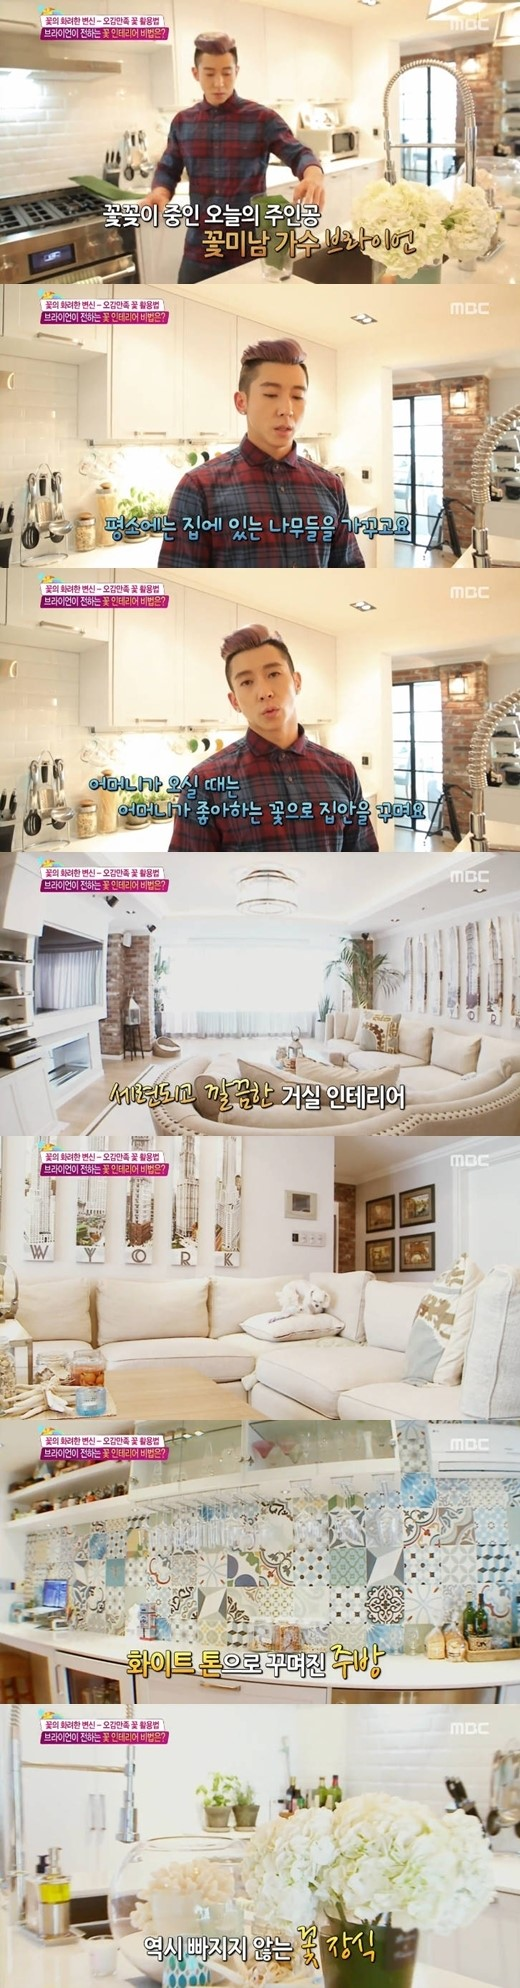 brian joo house